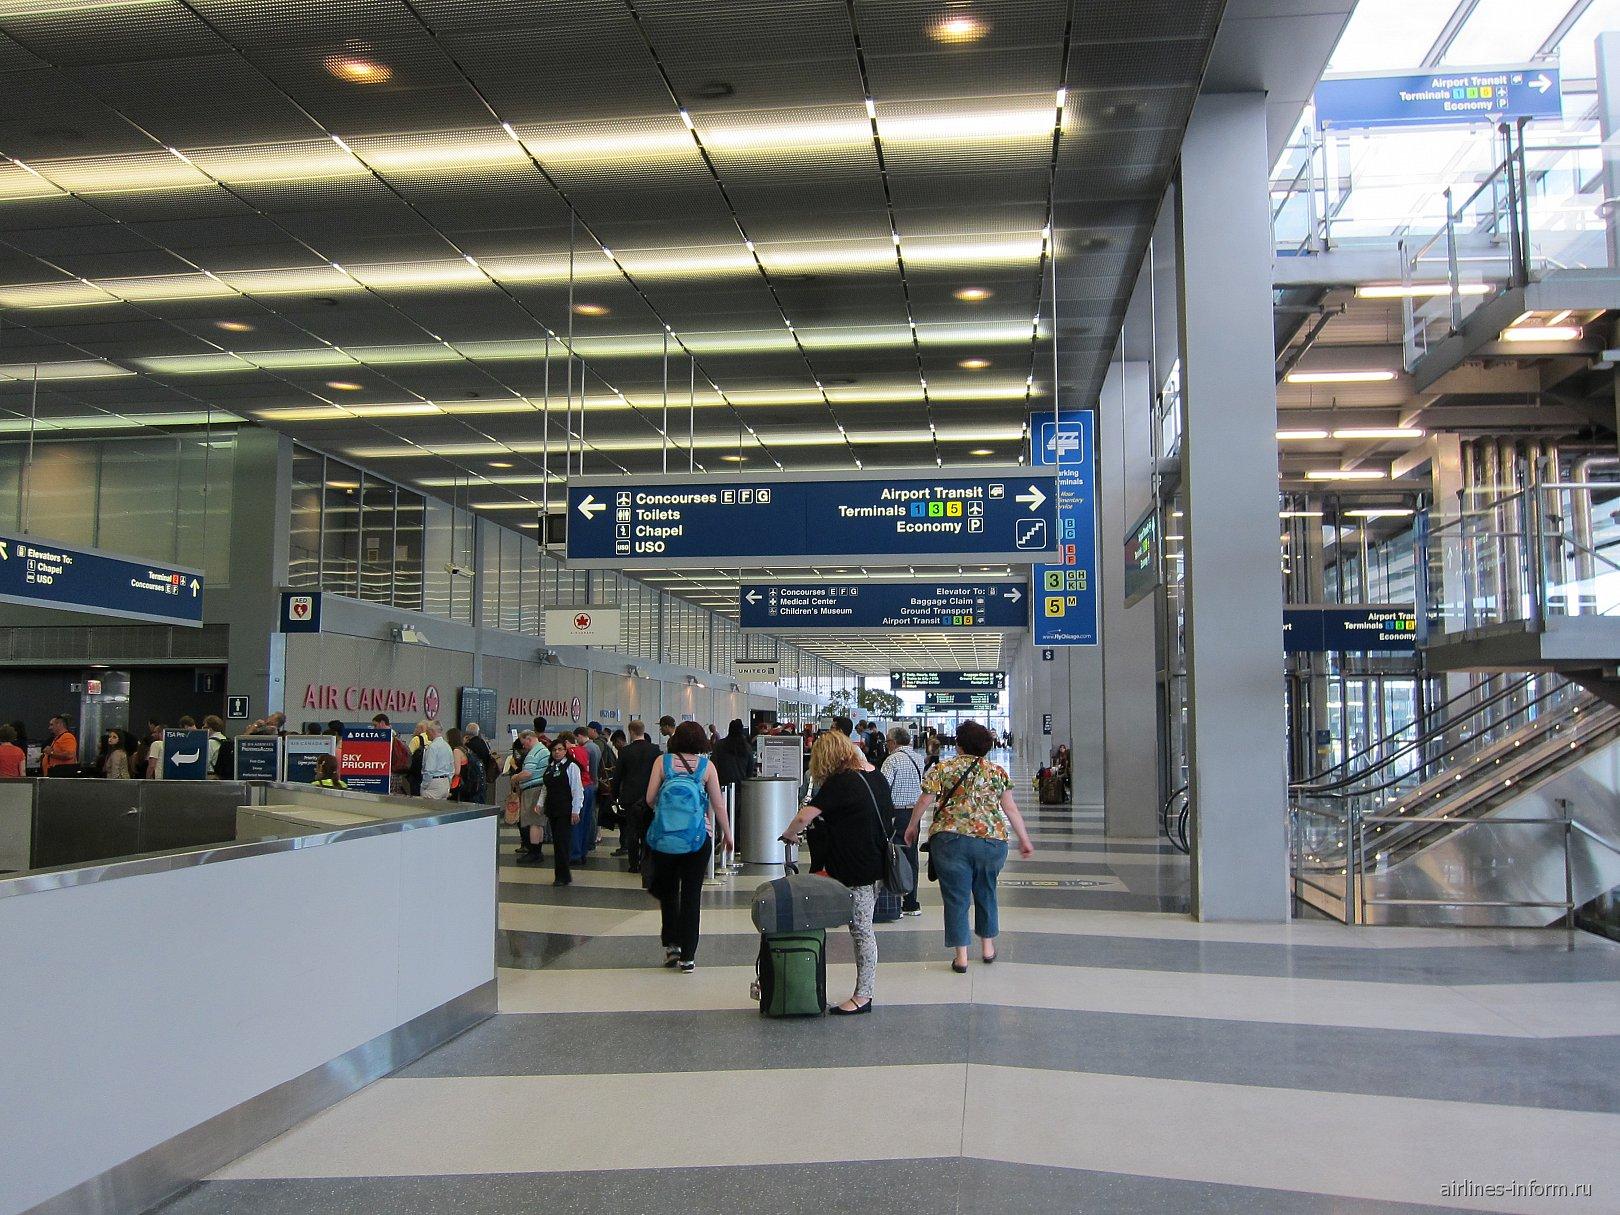 В терминале 2 аэропорта Чикаго О'Хара